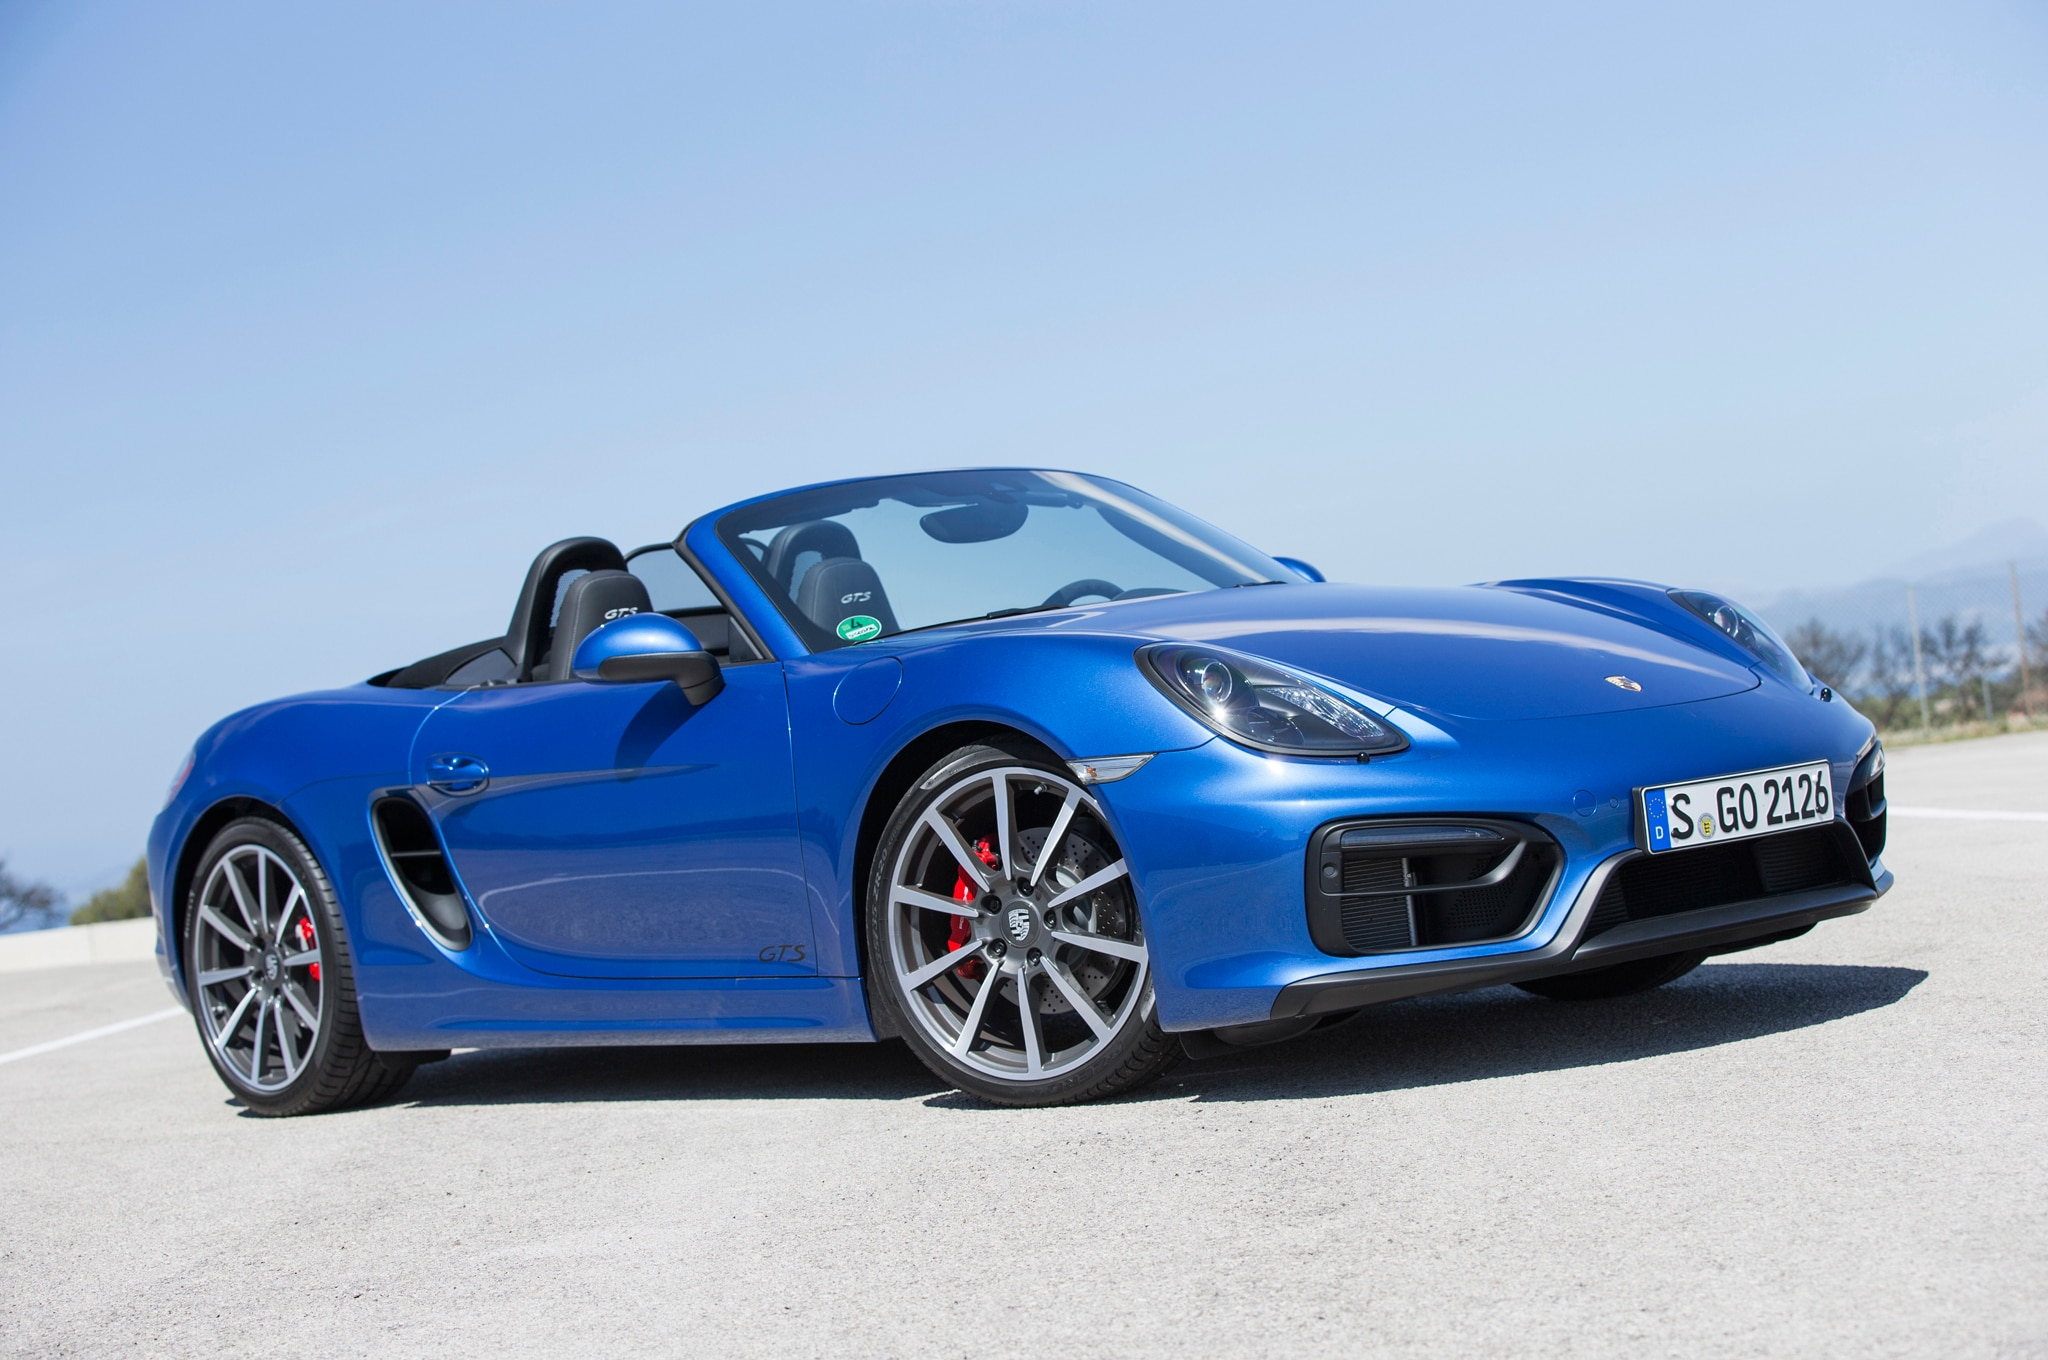 2015 Porsche Boxster GTS Front Three Quarter1